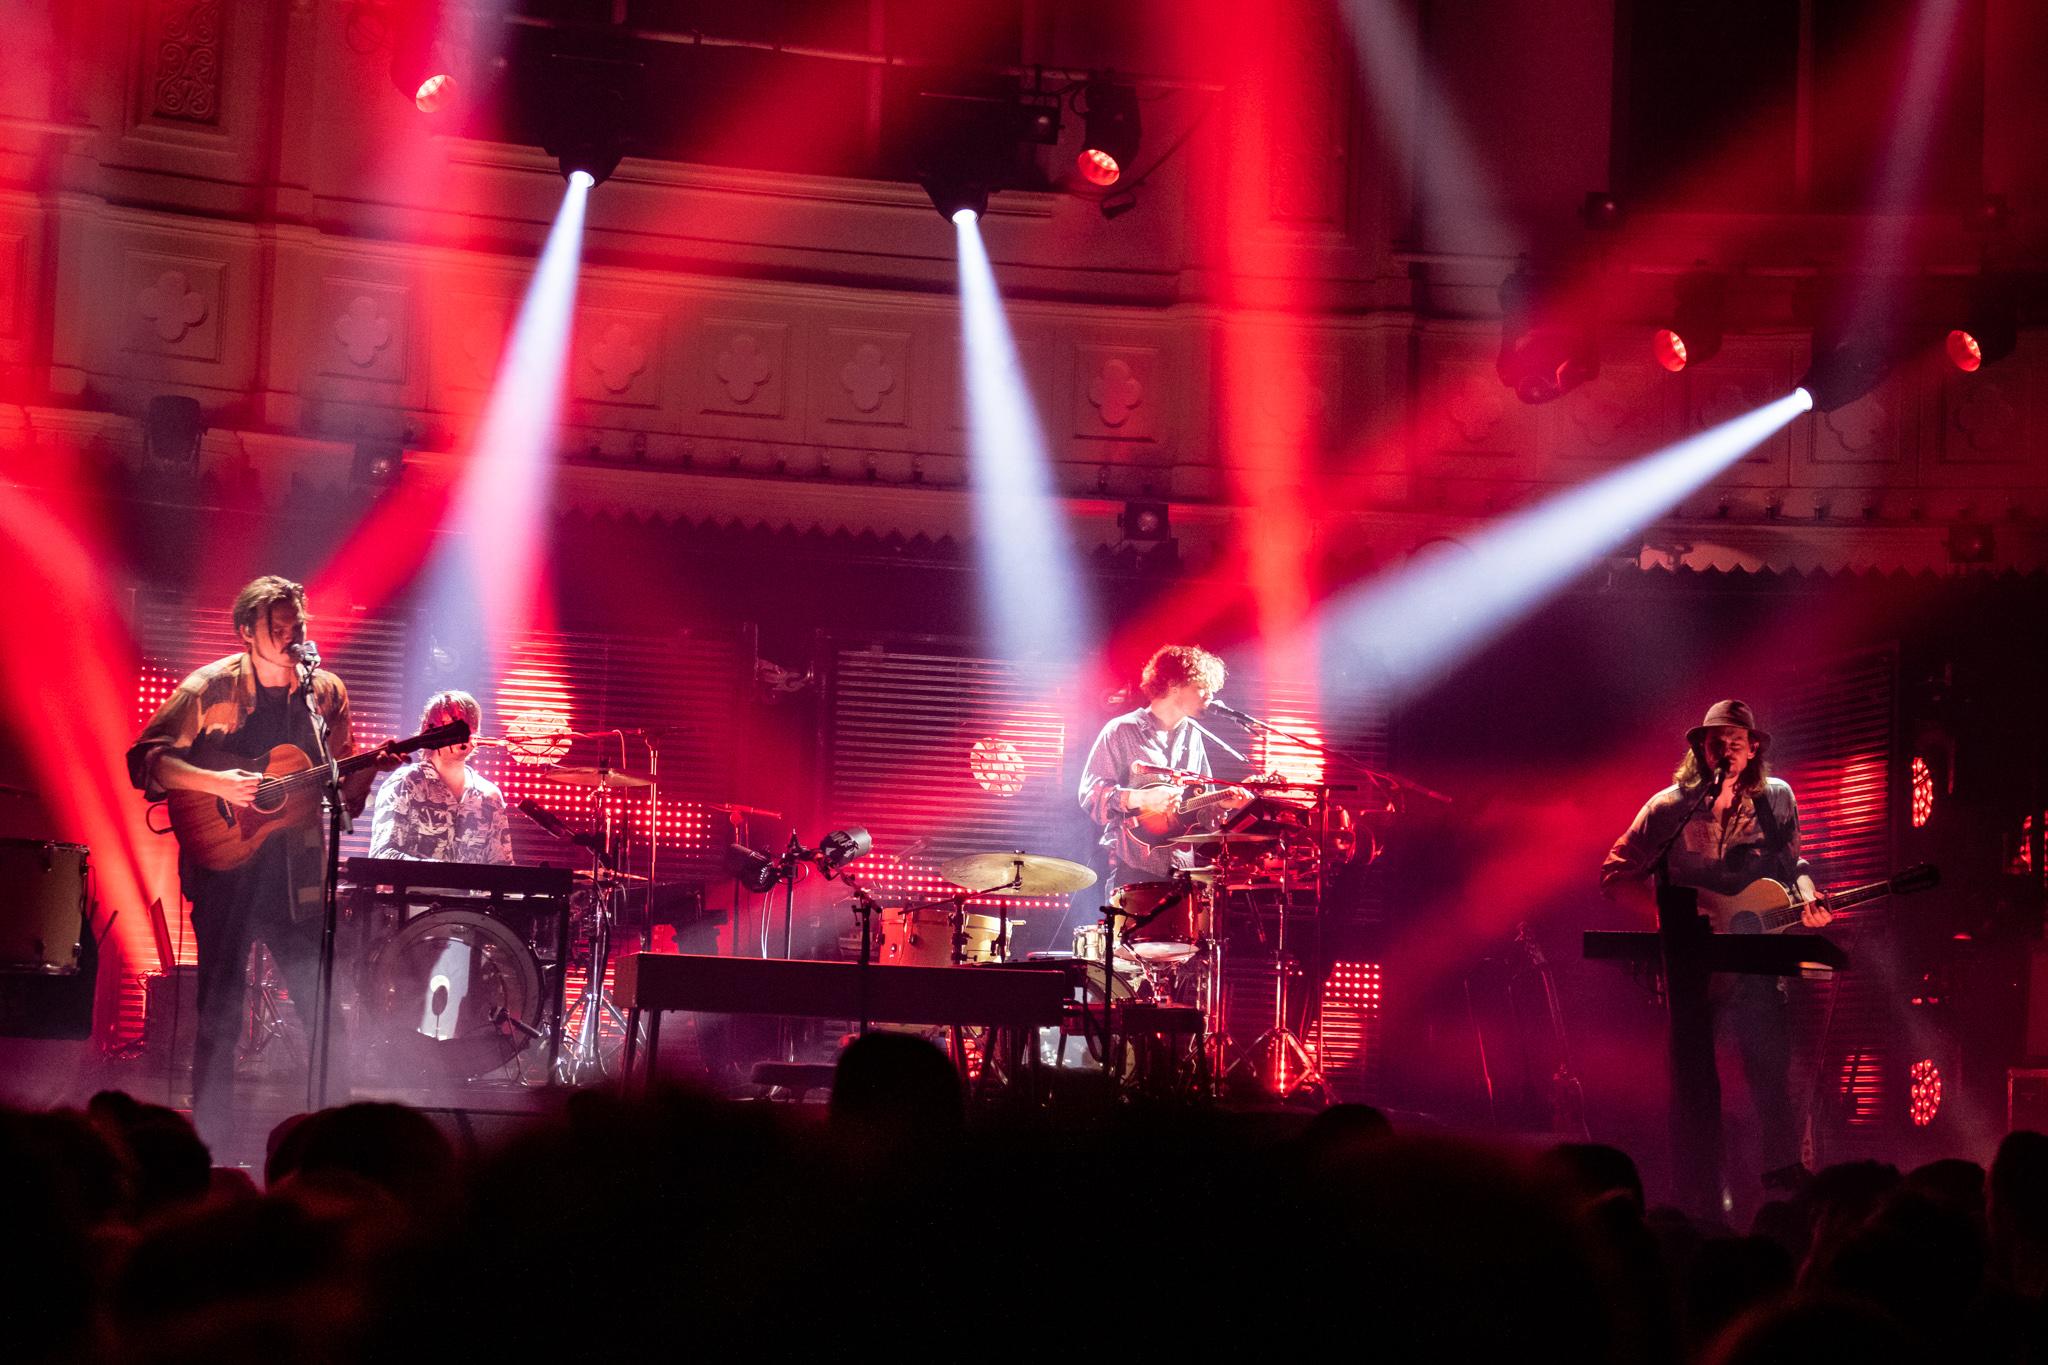 HalfMoonRun-Paradiso-Amsterdam_NL-20191113-SylviaWijnands-014